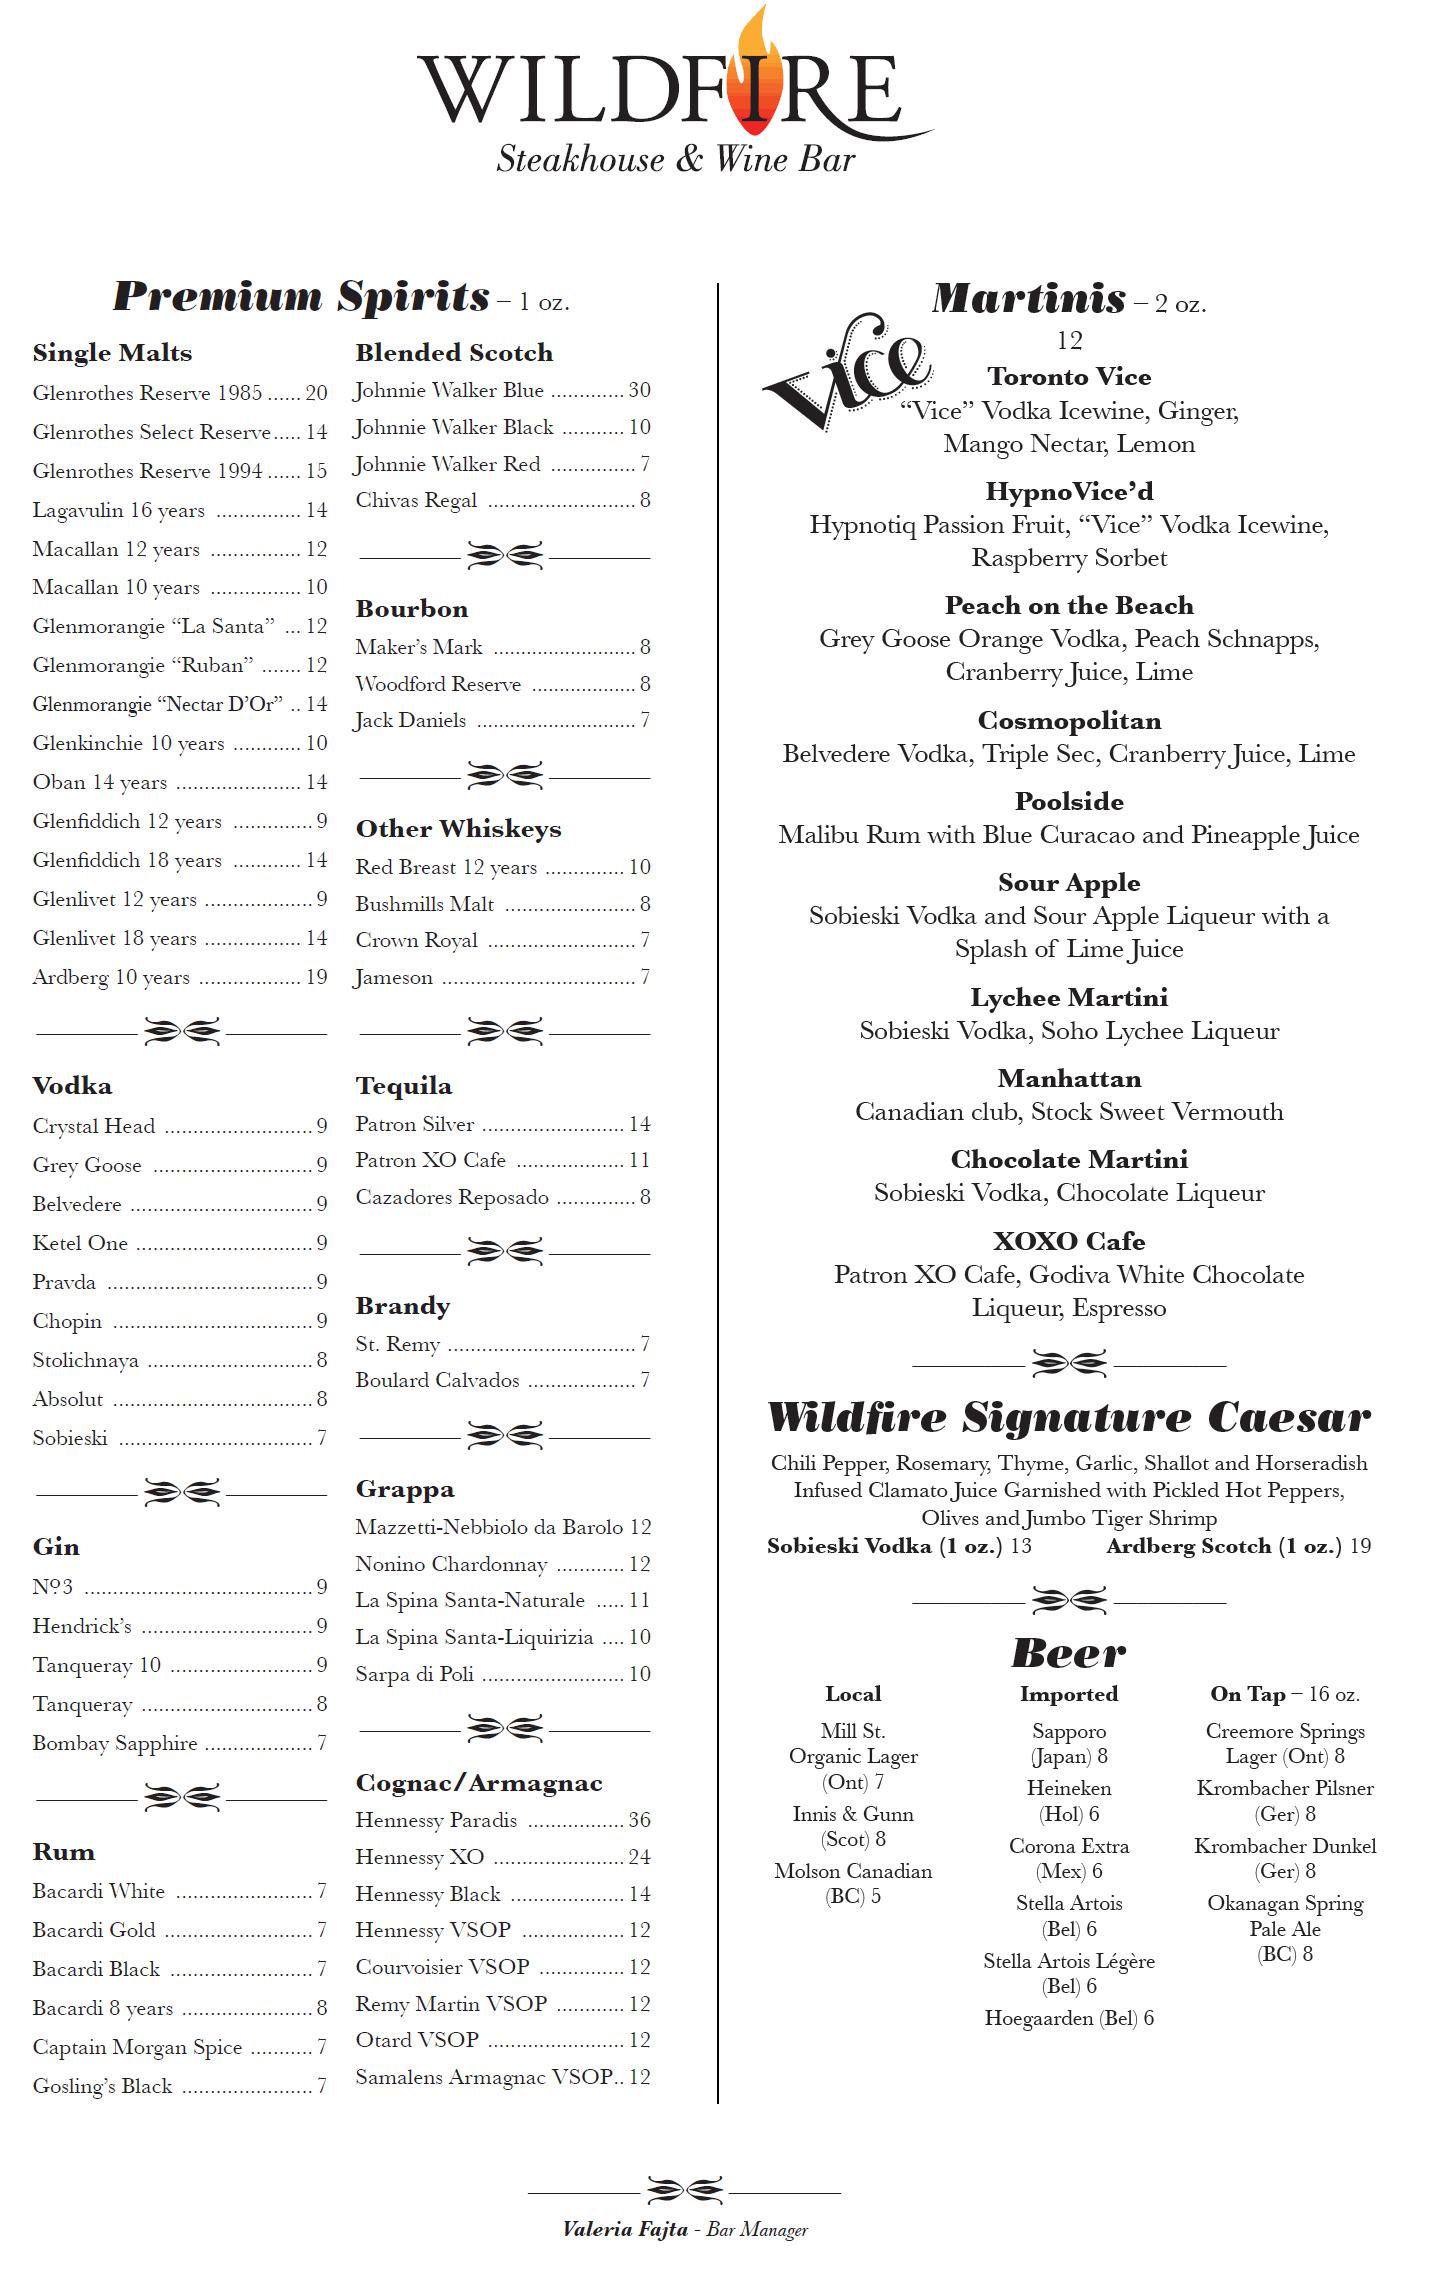 Wildfire Steakhouse & Wine Bar Menu - Spirits | food menu ...